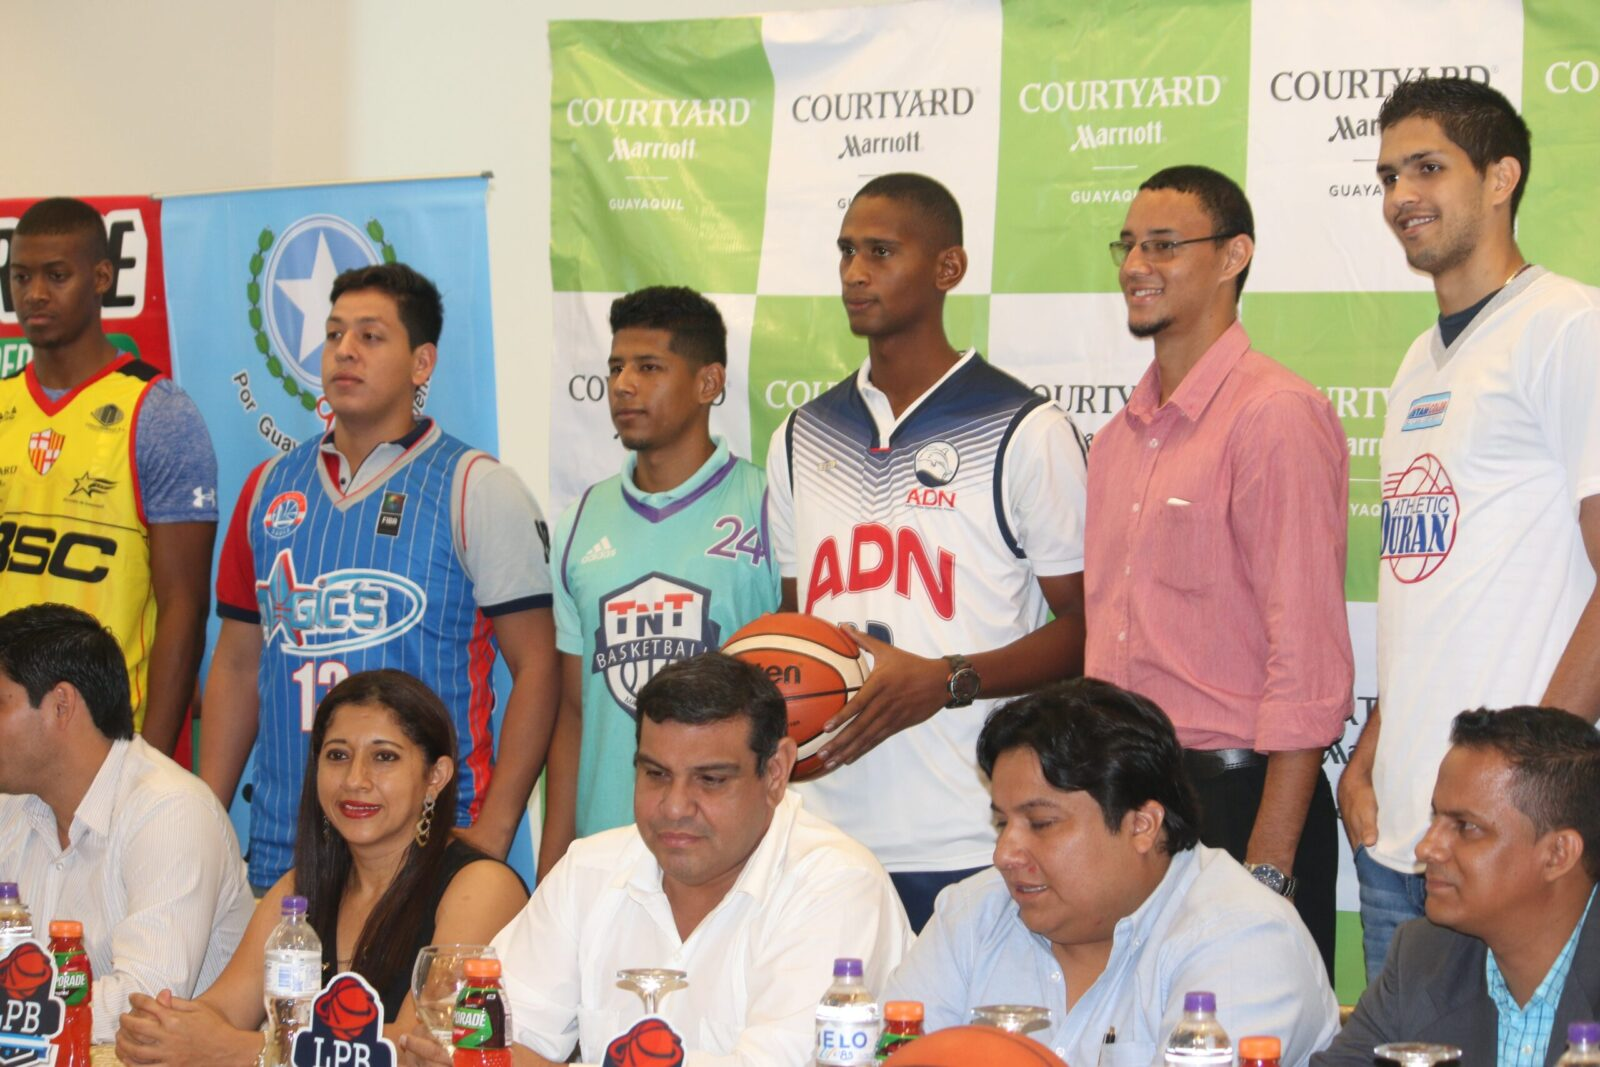 Todo listo para la Liga Provincial de Baloncesto